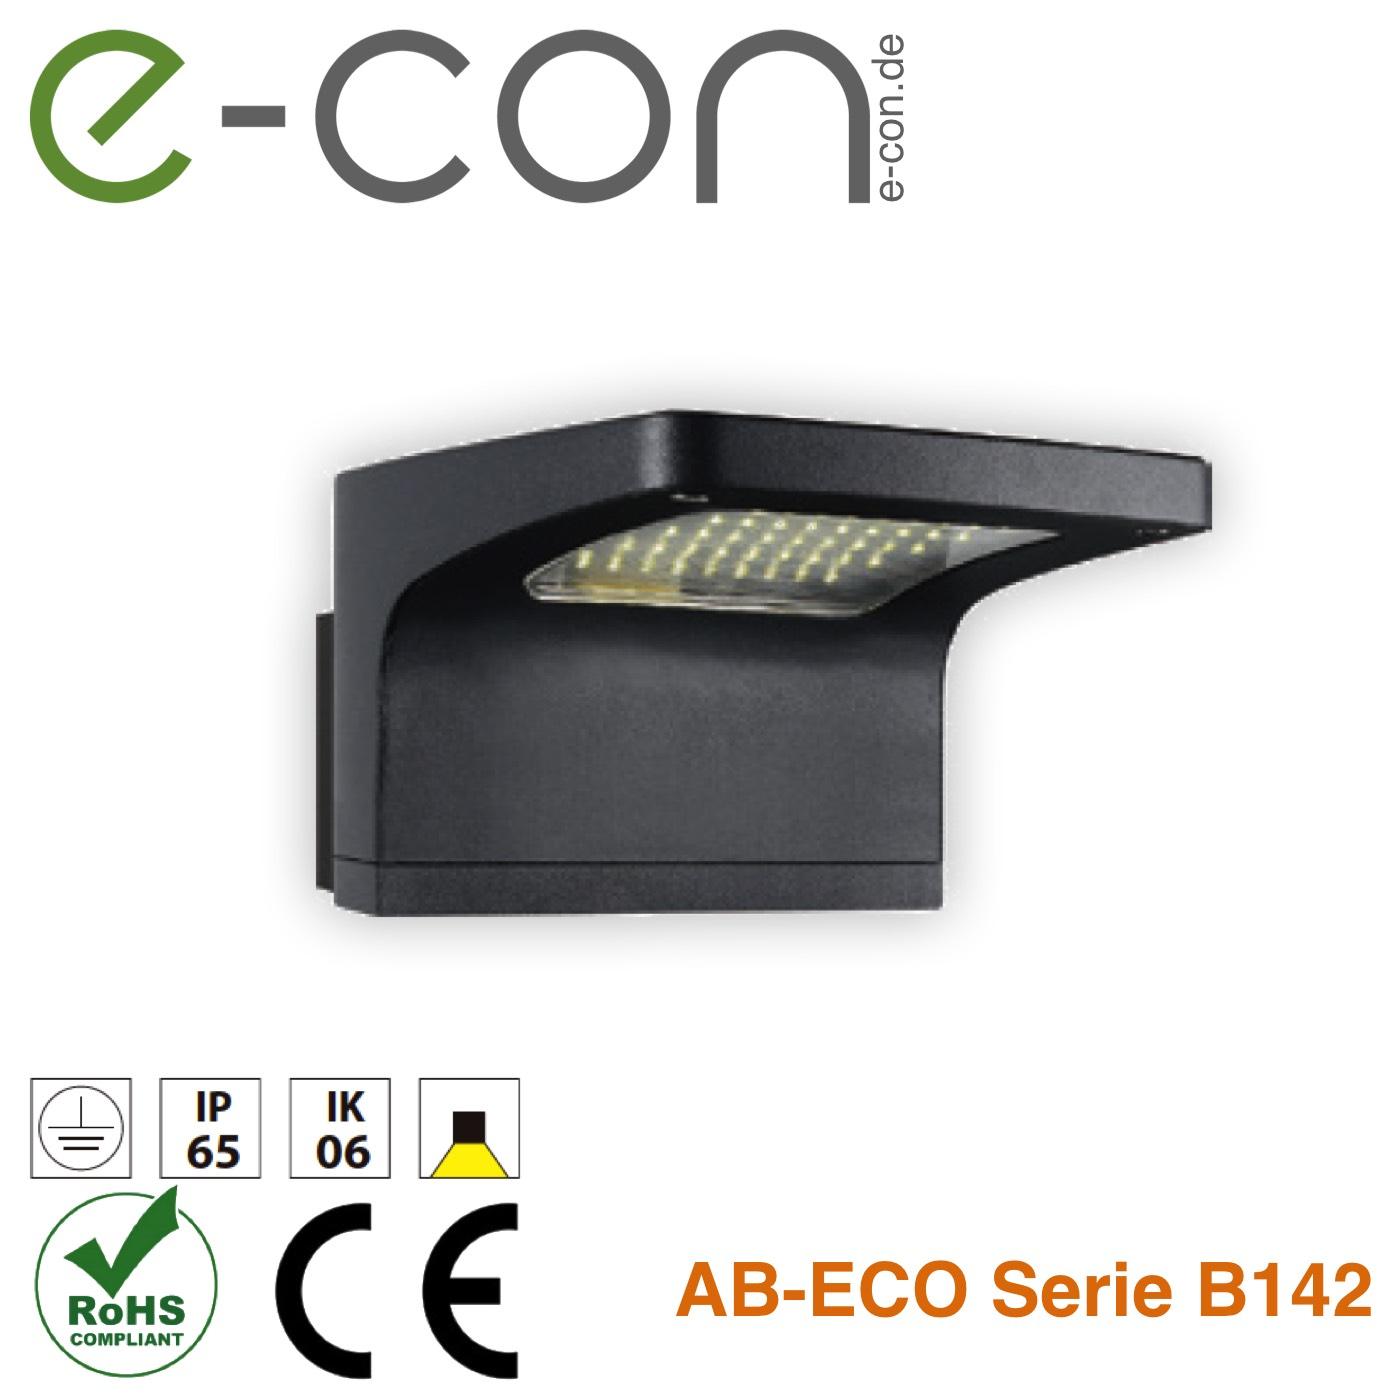 AB-ECO Serie B142